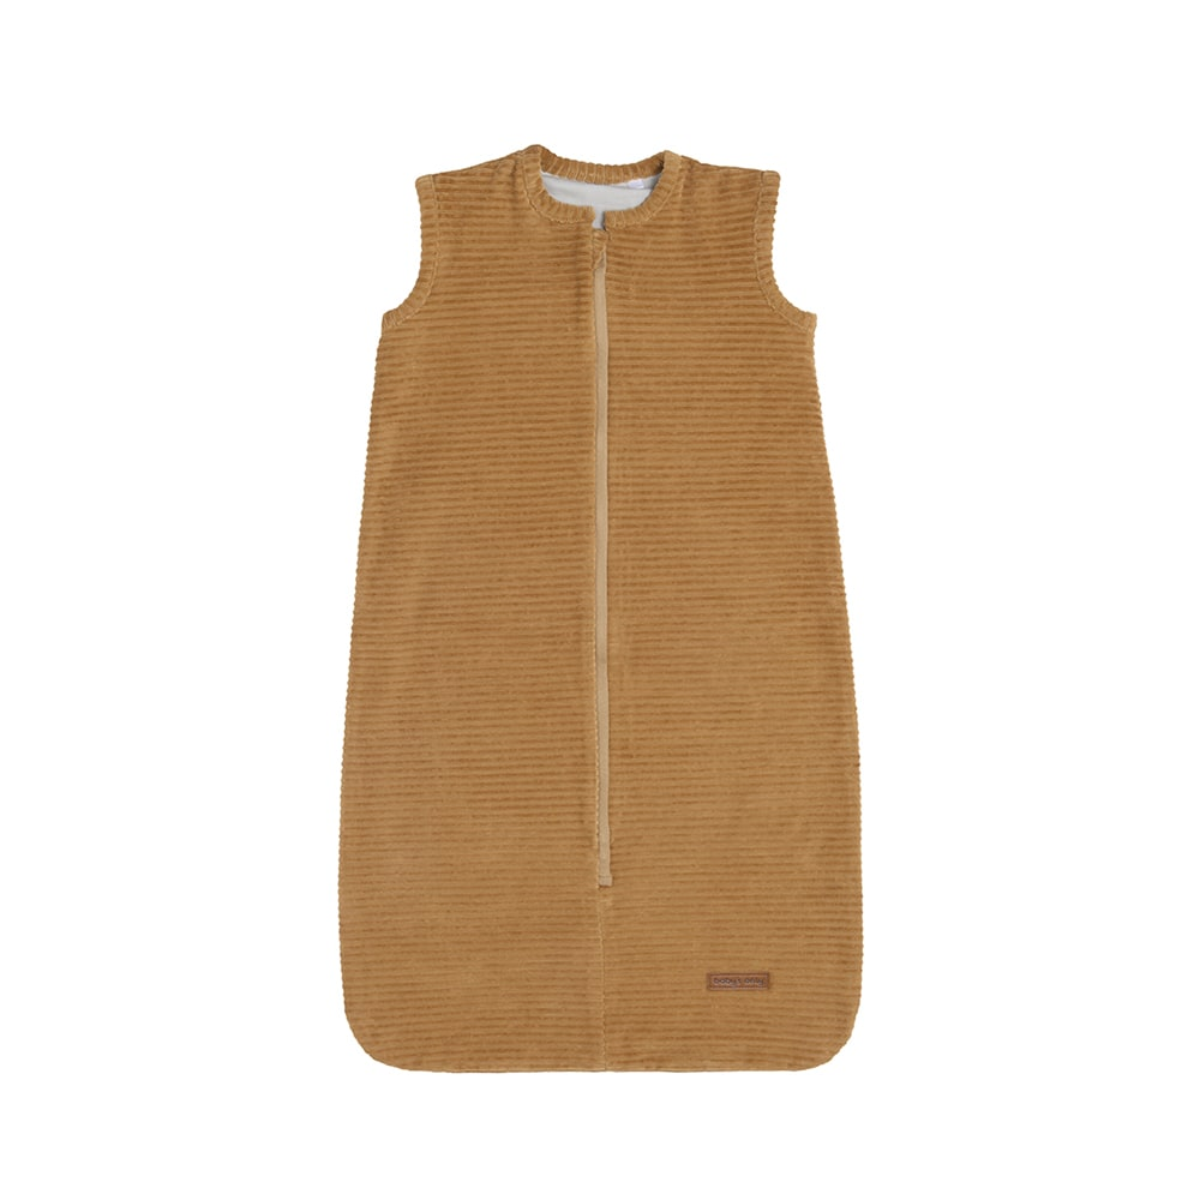 sleeping bag sense caramel 70 cm